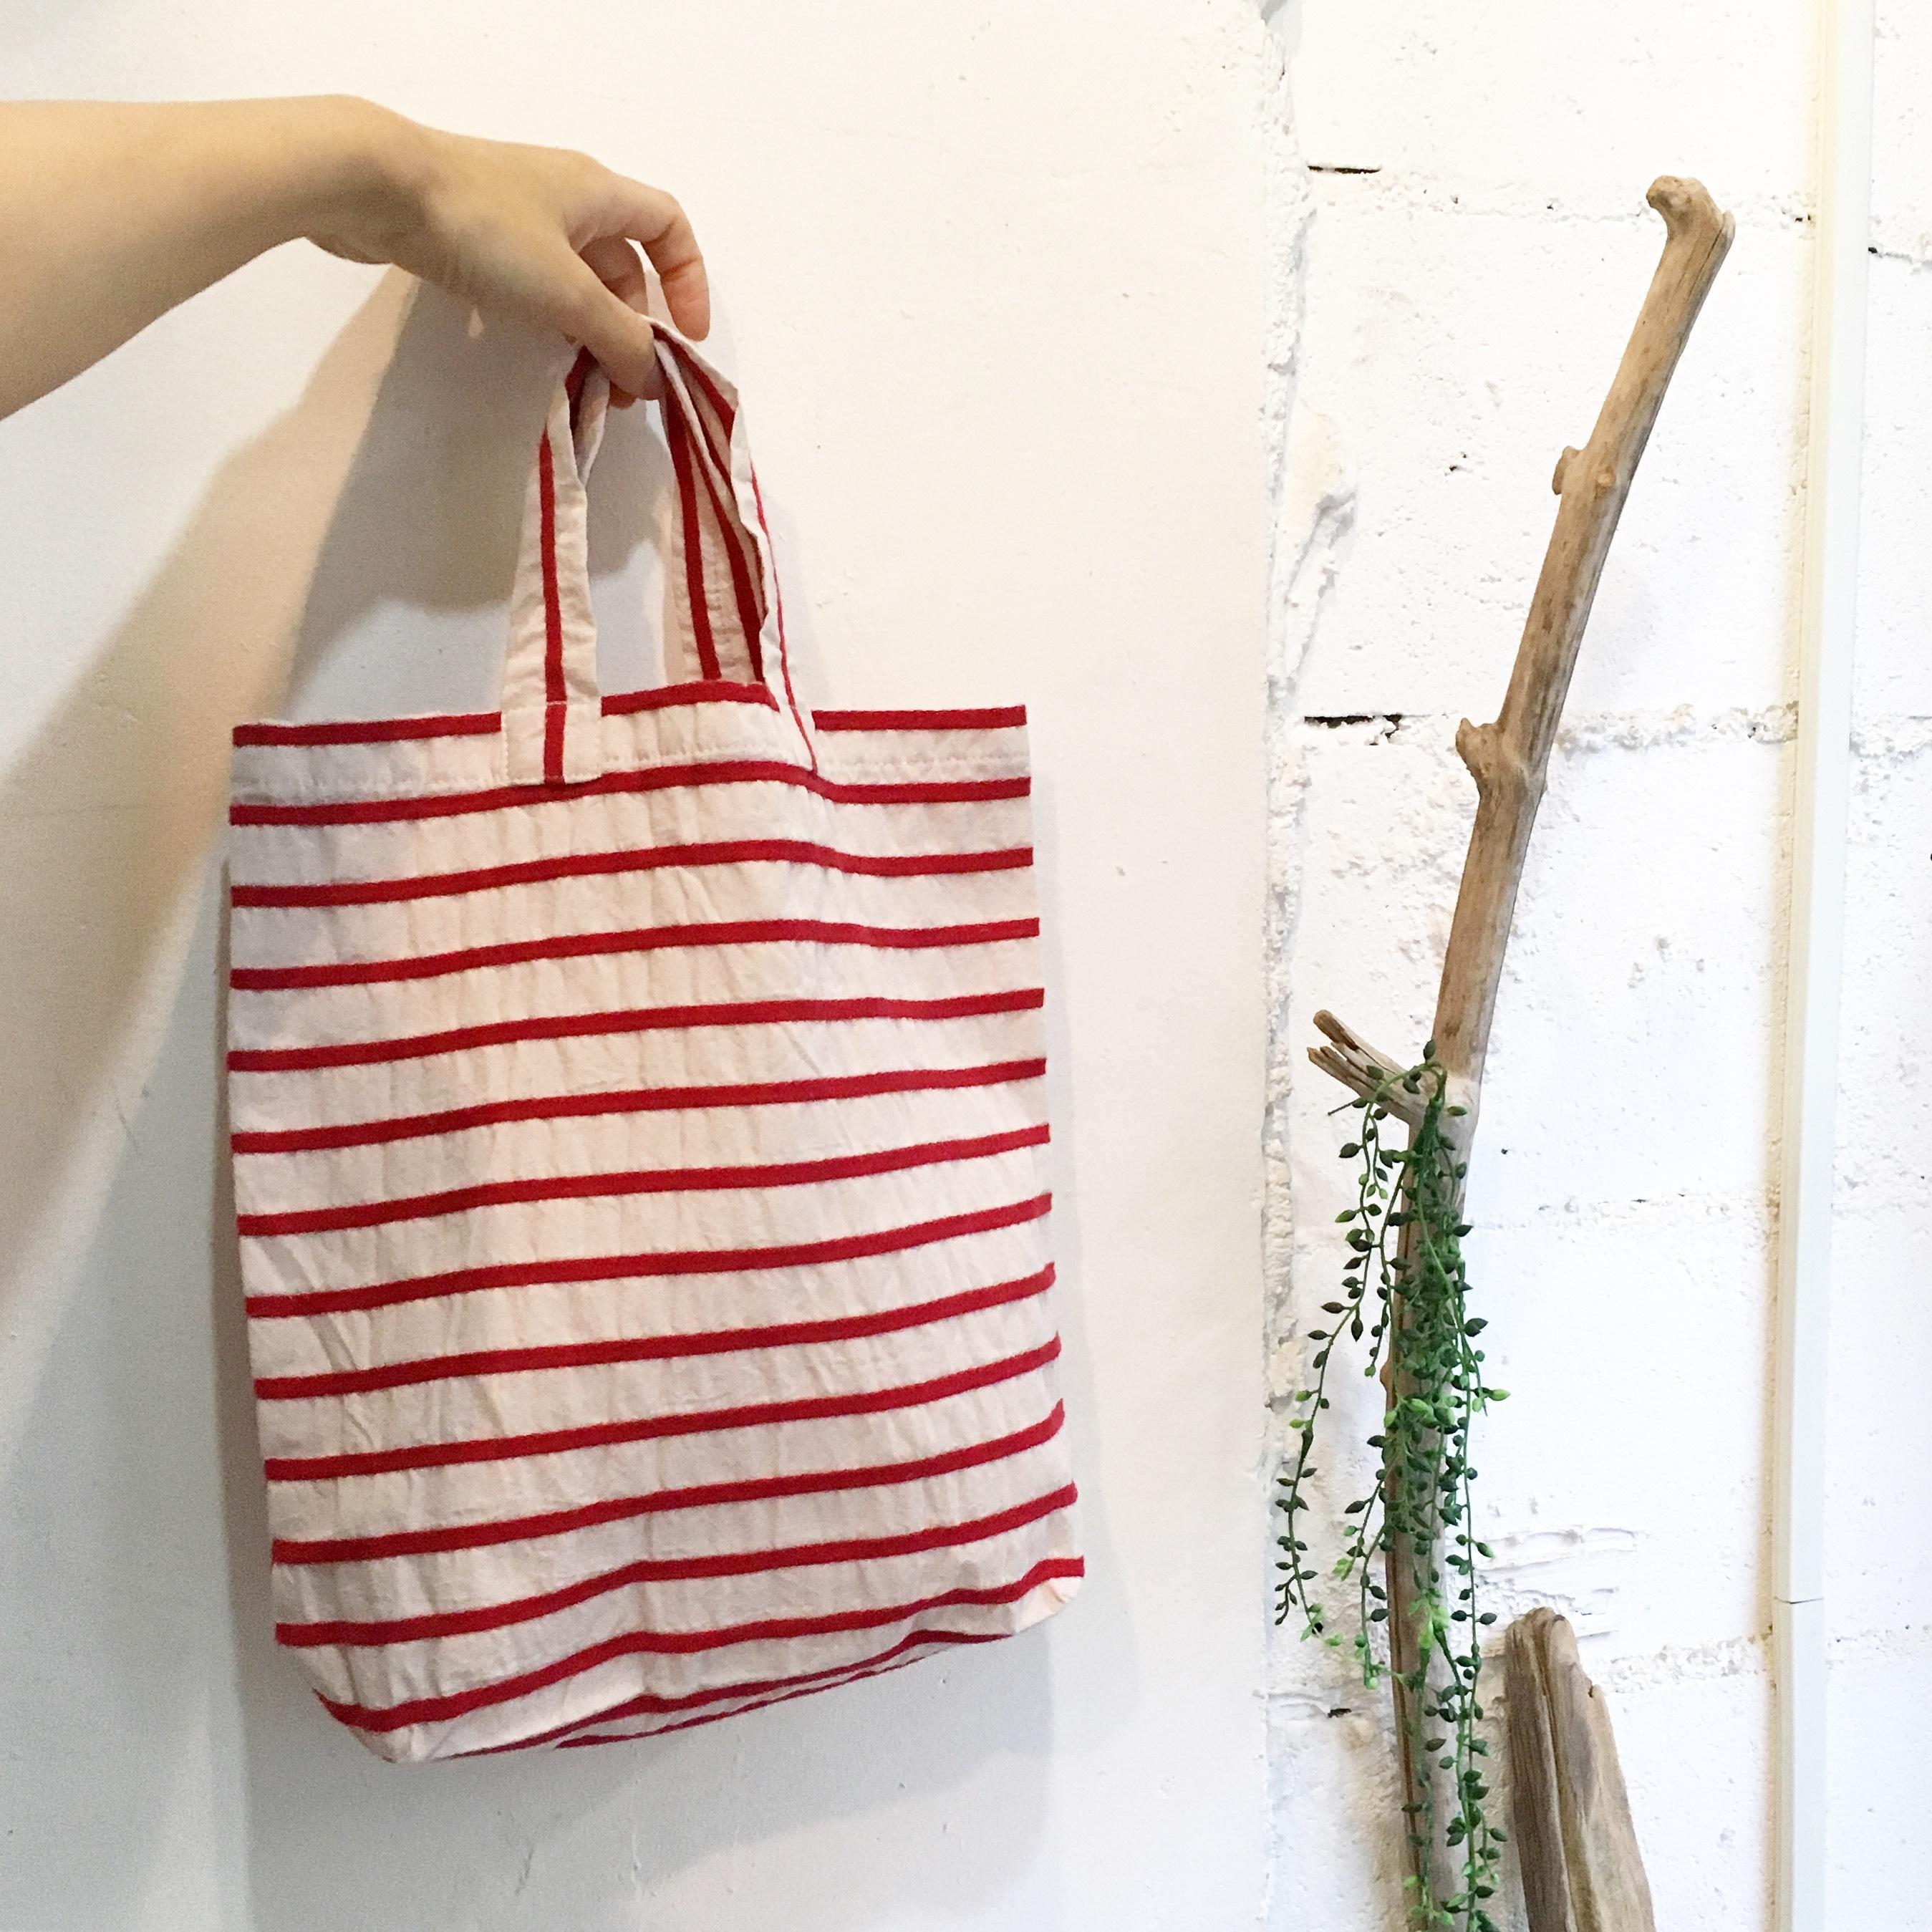 【maco】トートbag Mサイズ(赤ボーダー)